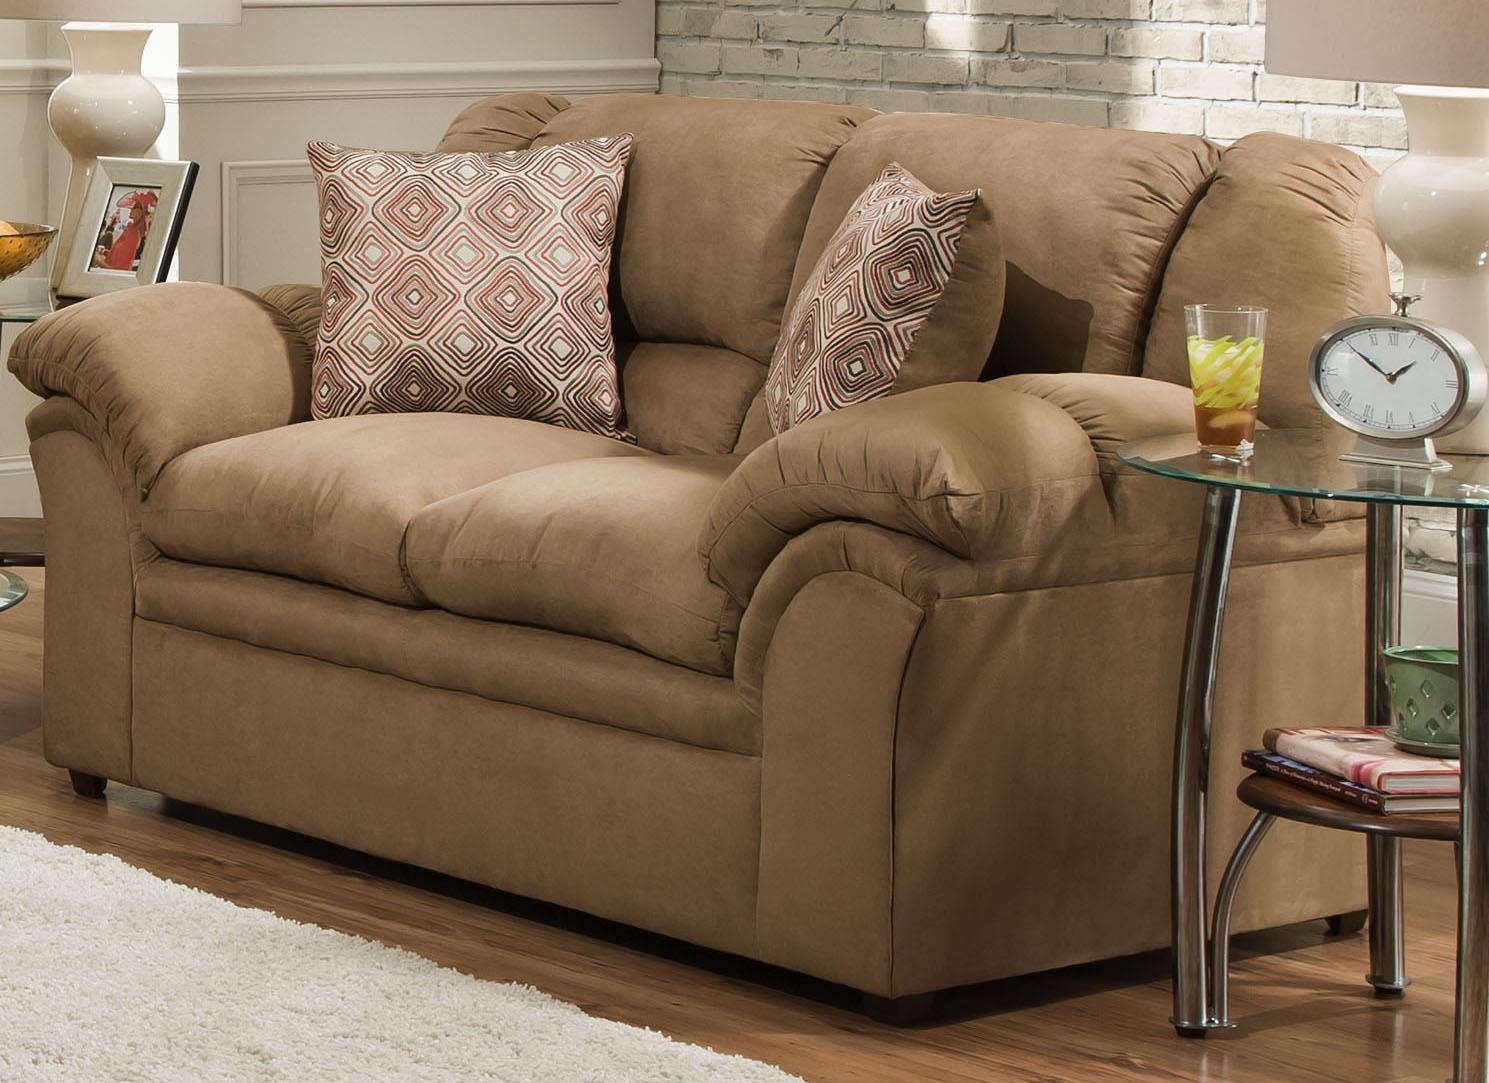 United Furniture Industries 1720 Love Seat